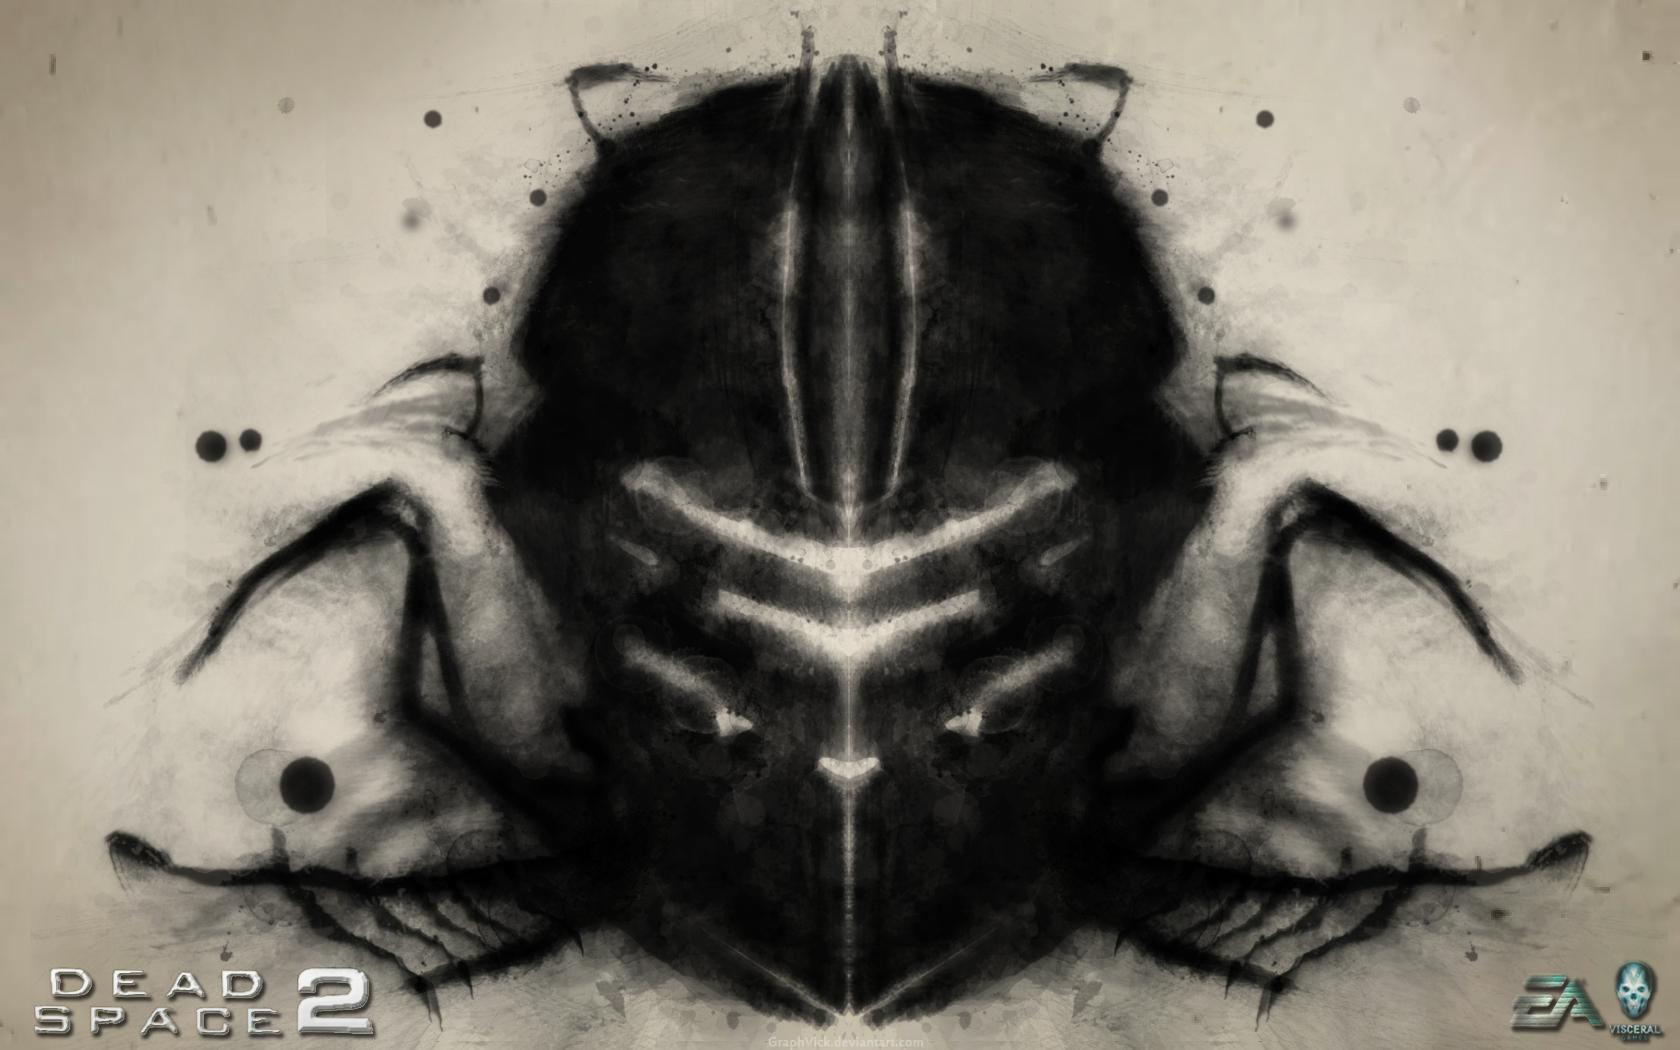 Dead Space 2 Wallpaper By Graphvick On Deviantart